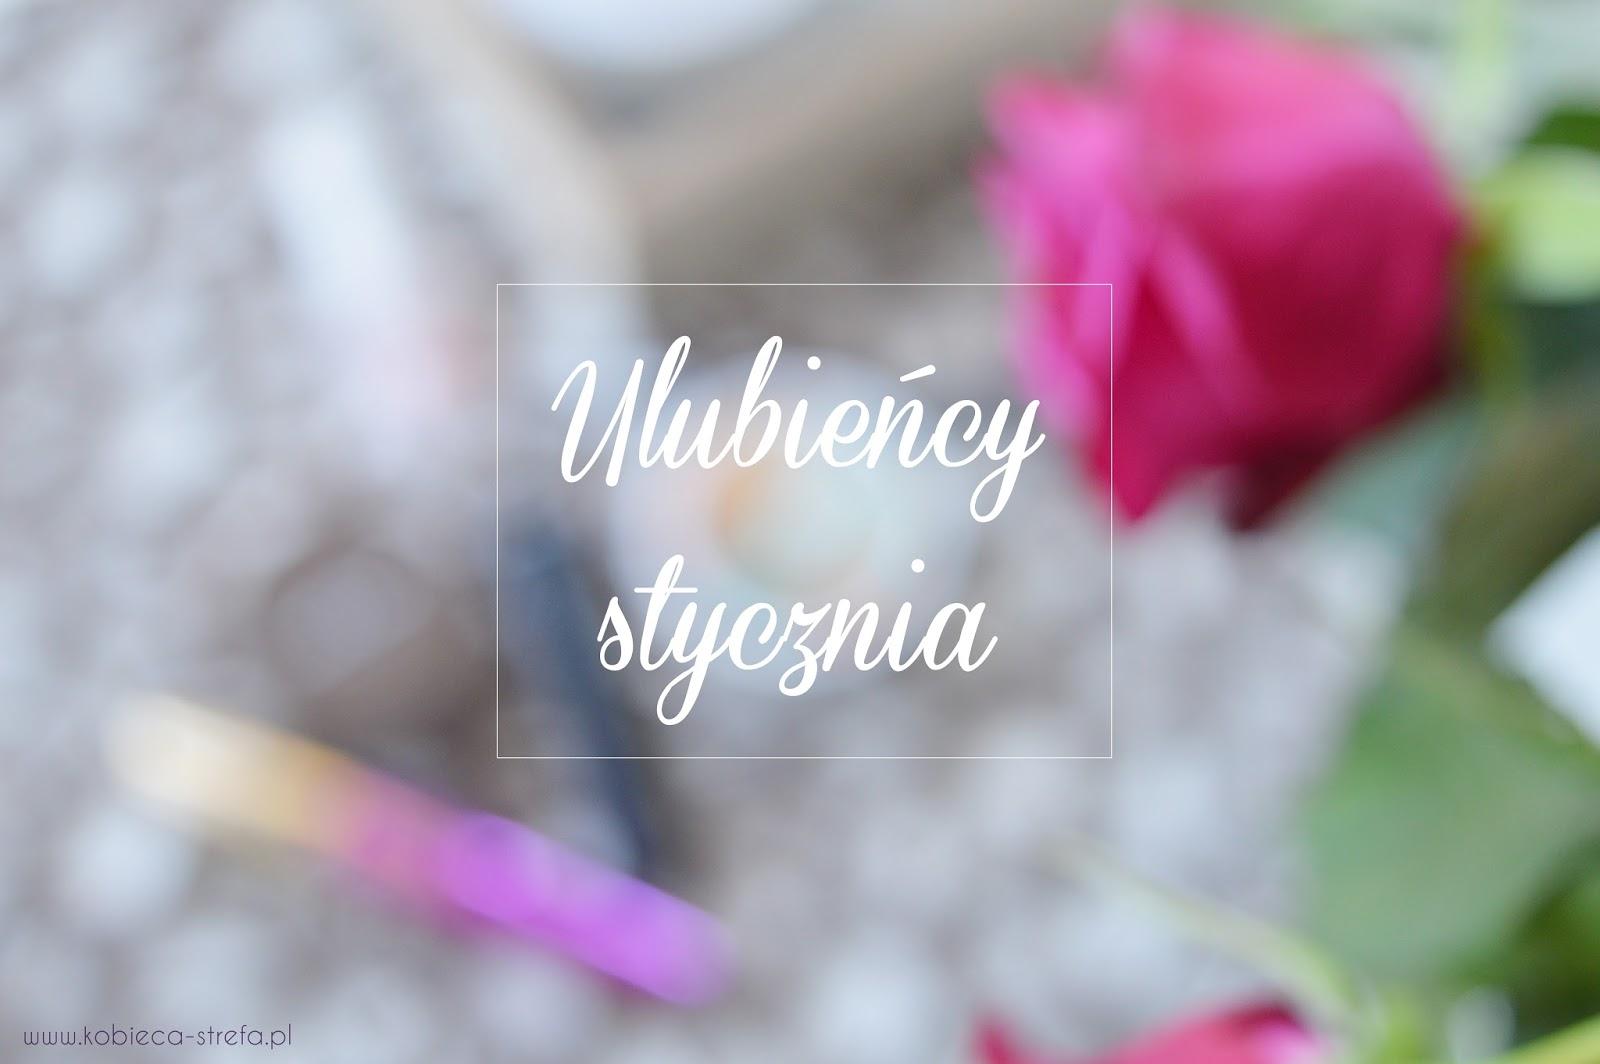 Ulubieńcy stycznia - Golden Rose, Sephora, Clare Blanc, Holika Holika.